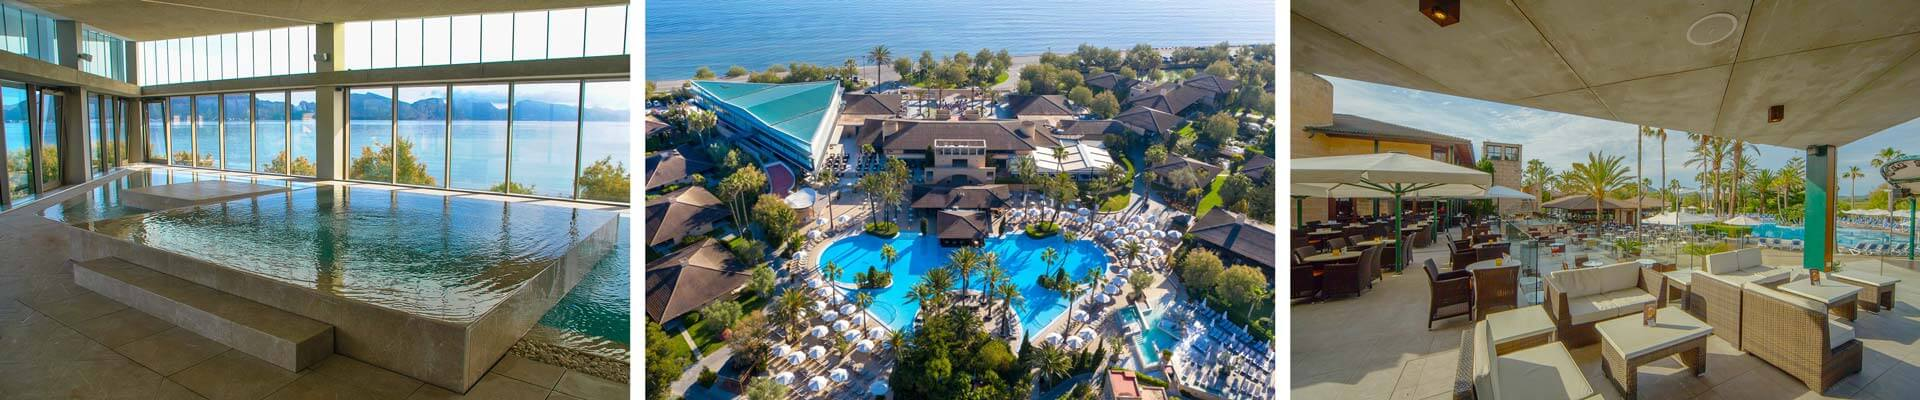 Impressionen zum Portblue Club Pollentia Resort & SPA